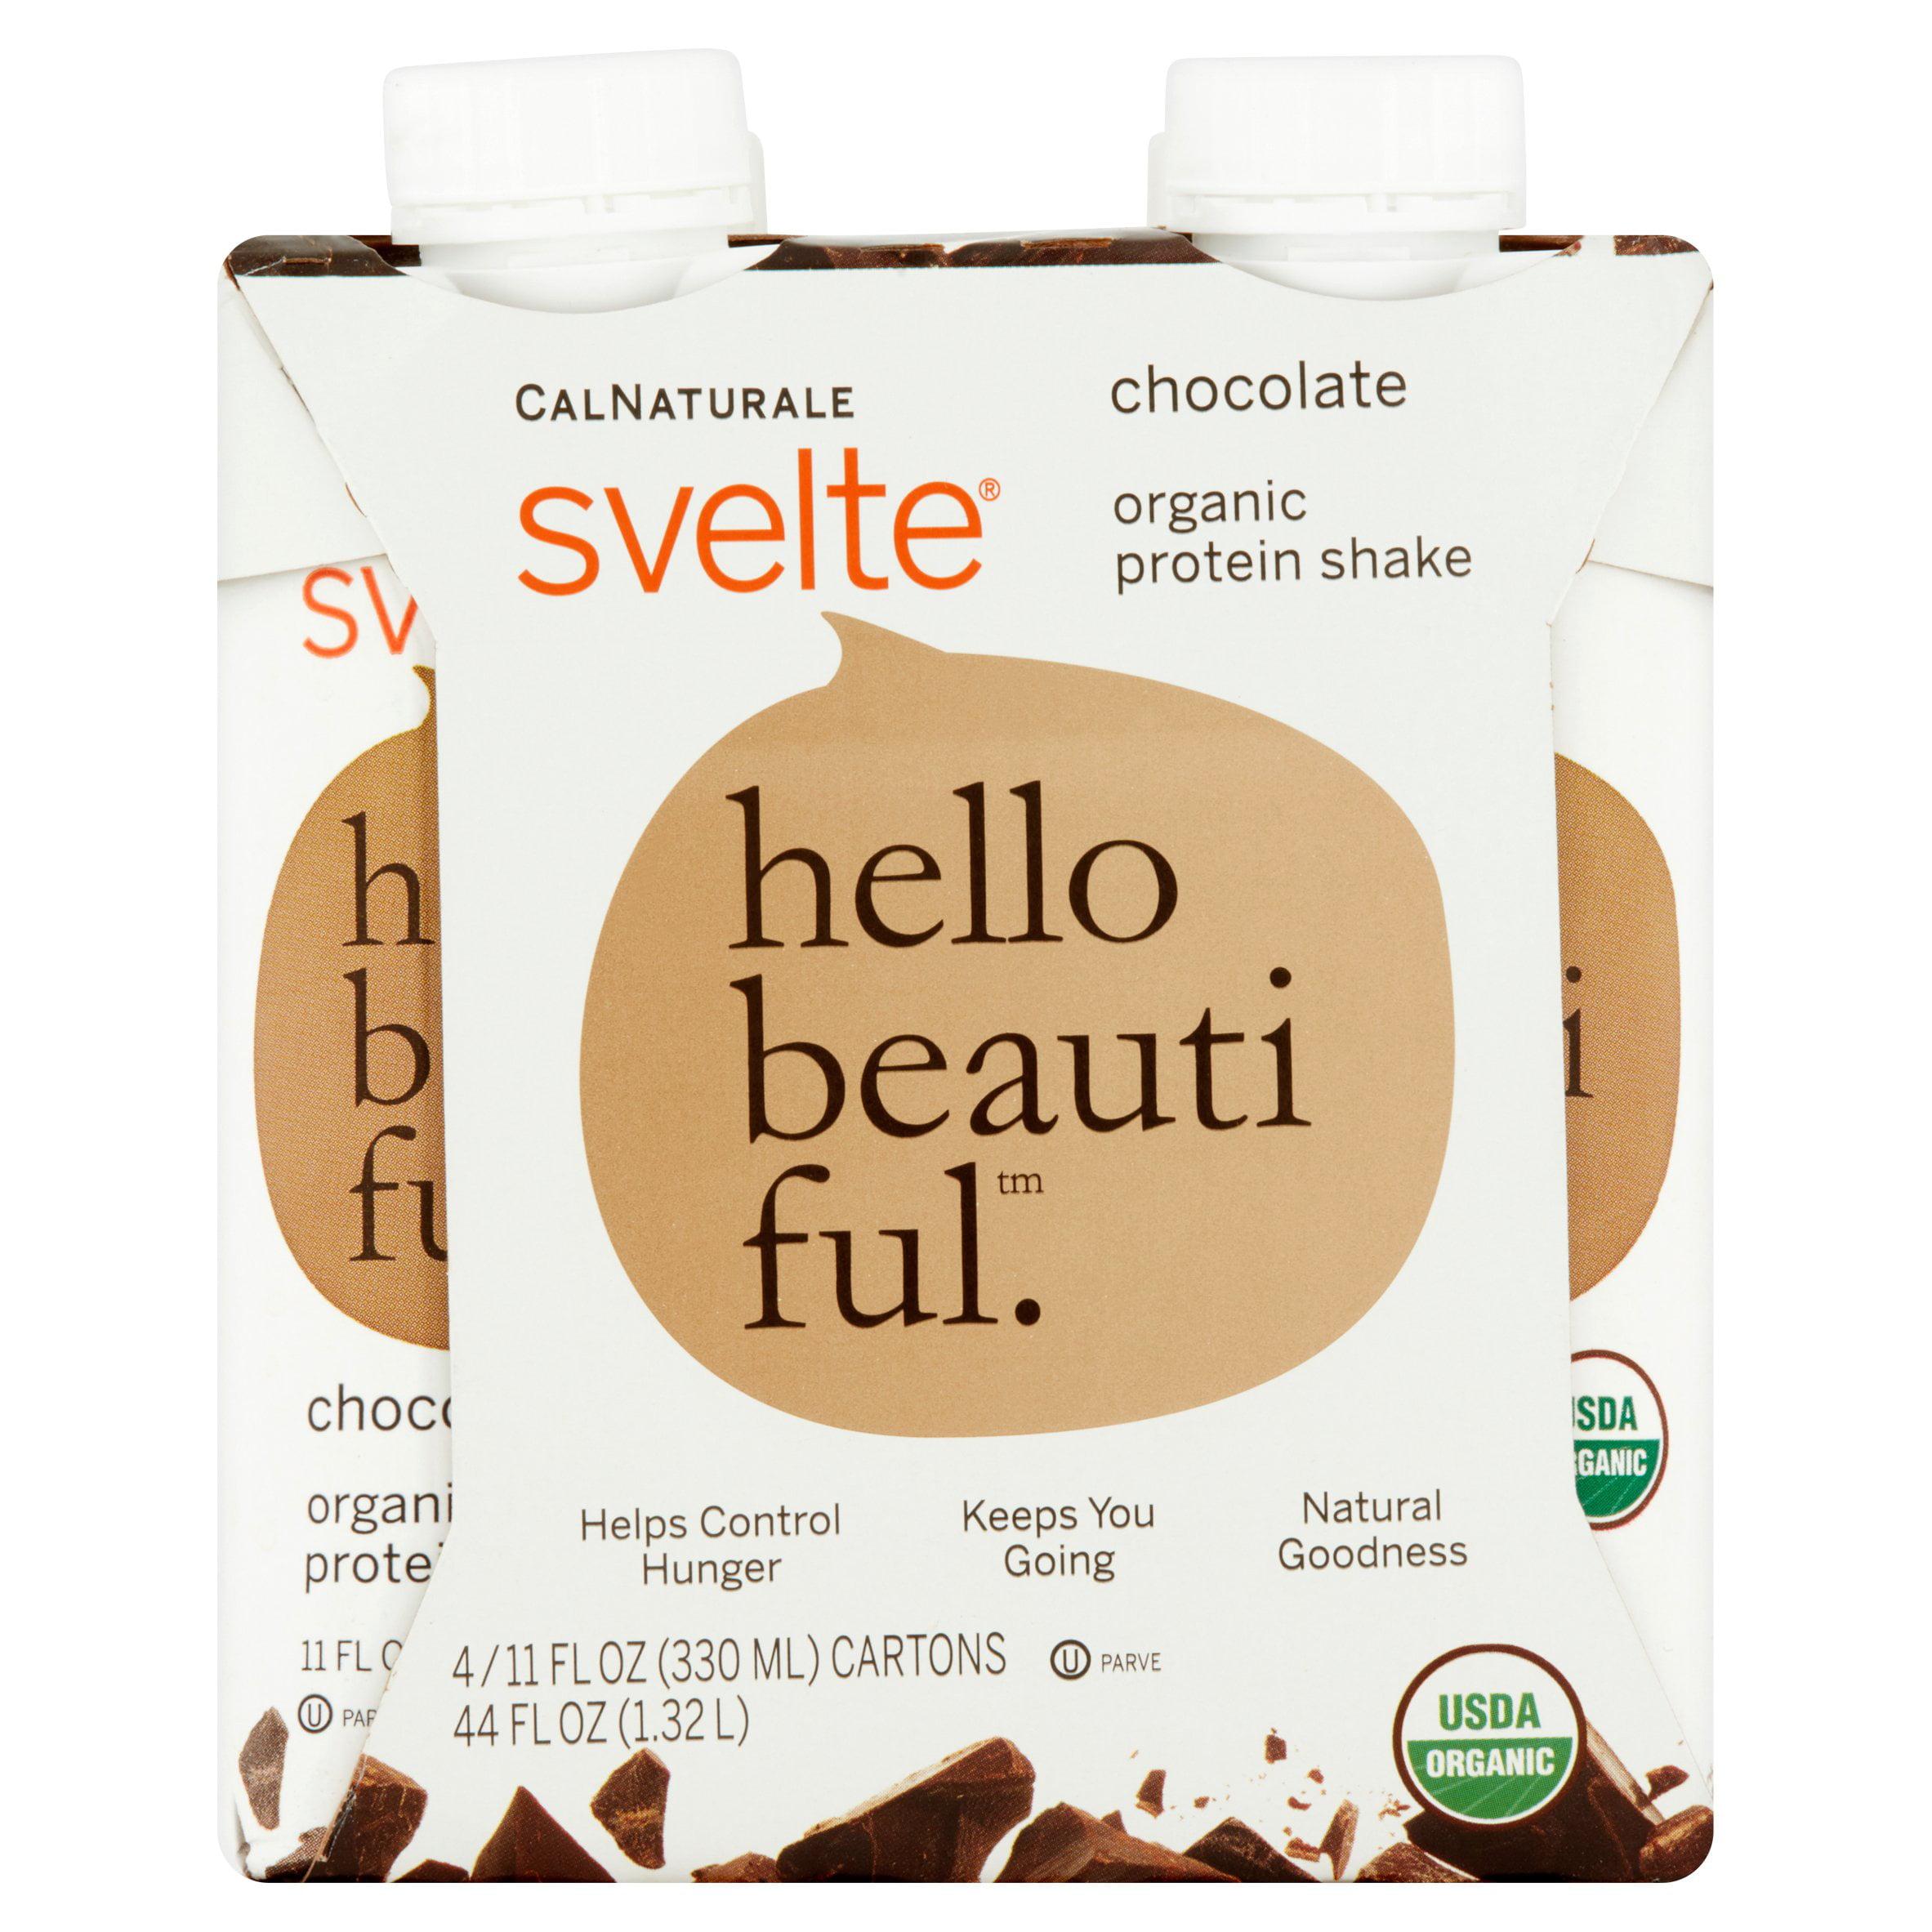 fedex pickup location w main st branford ct  calnaturale svelte chocolate